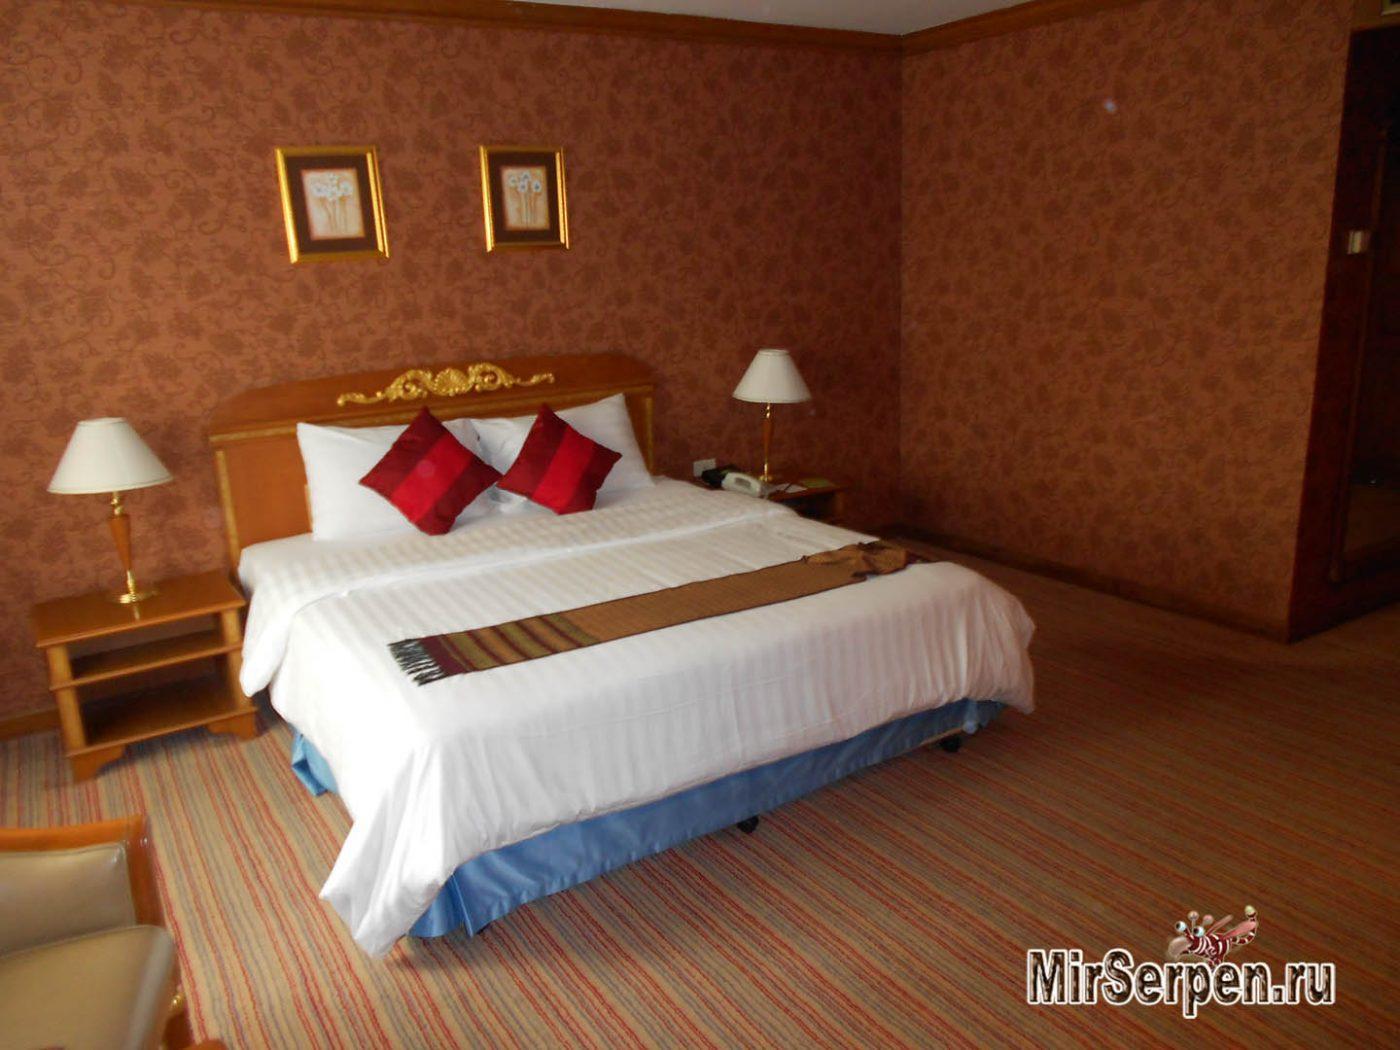 "Описание номеров тип ""Superior"" отеле Prince Palace 4*, Бангкок, Таиланд"